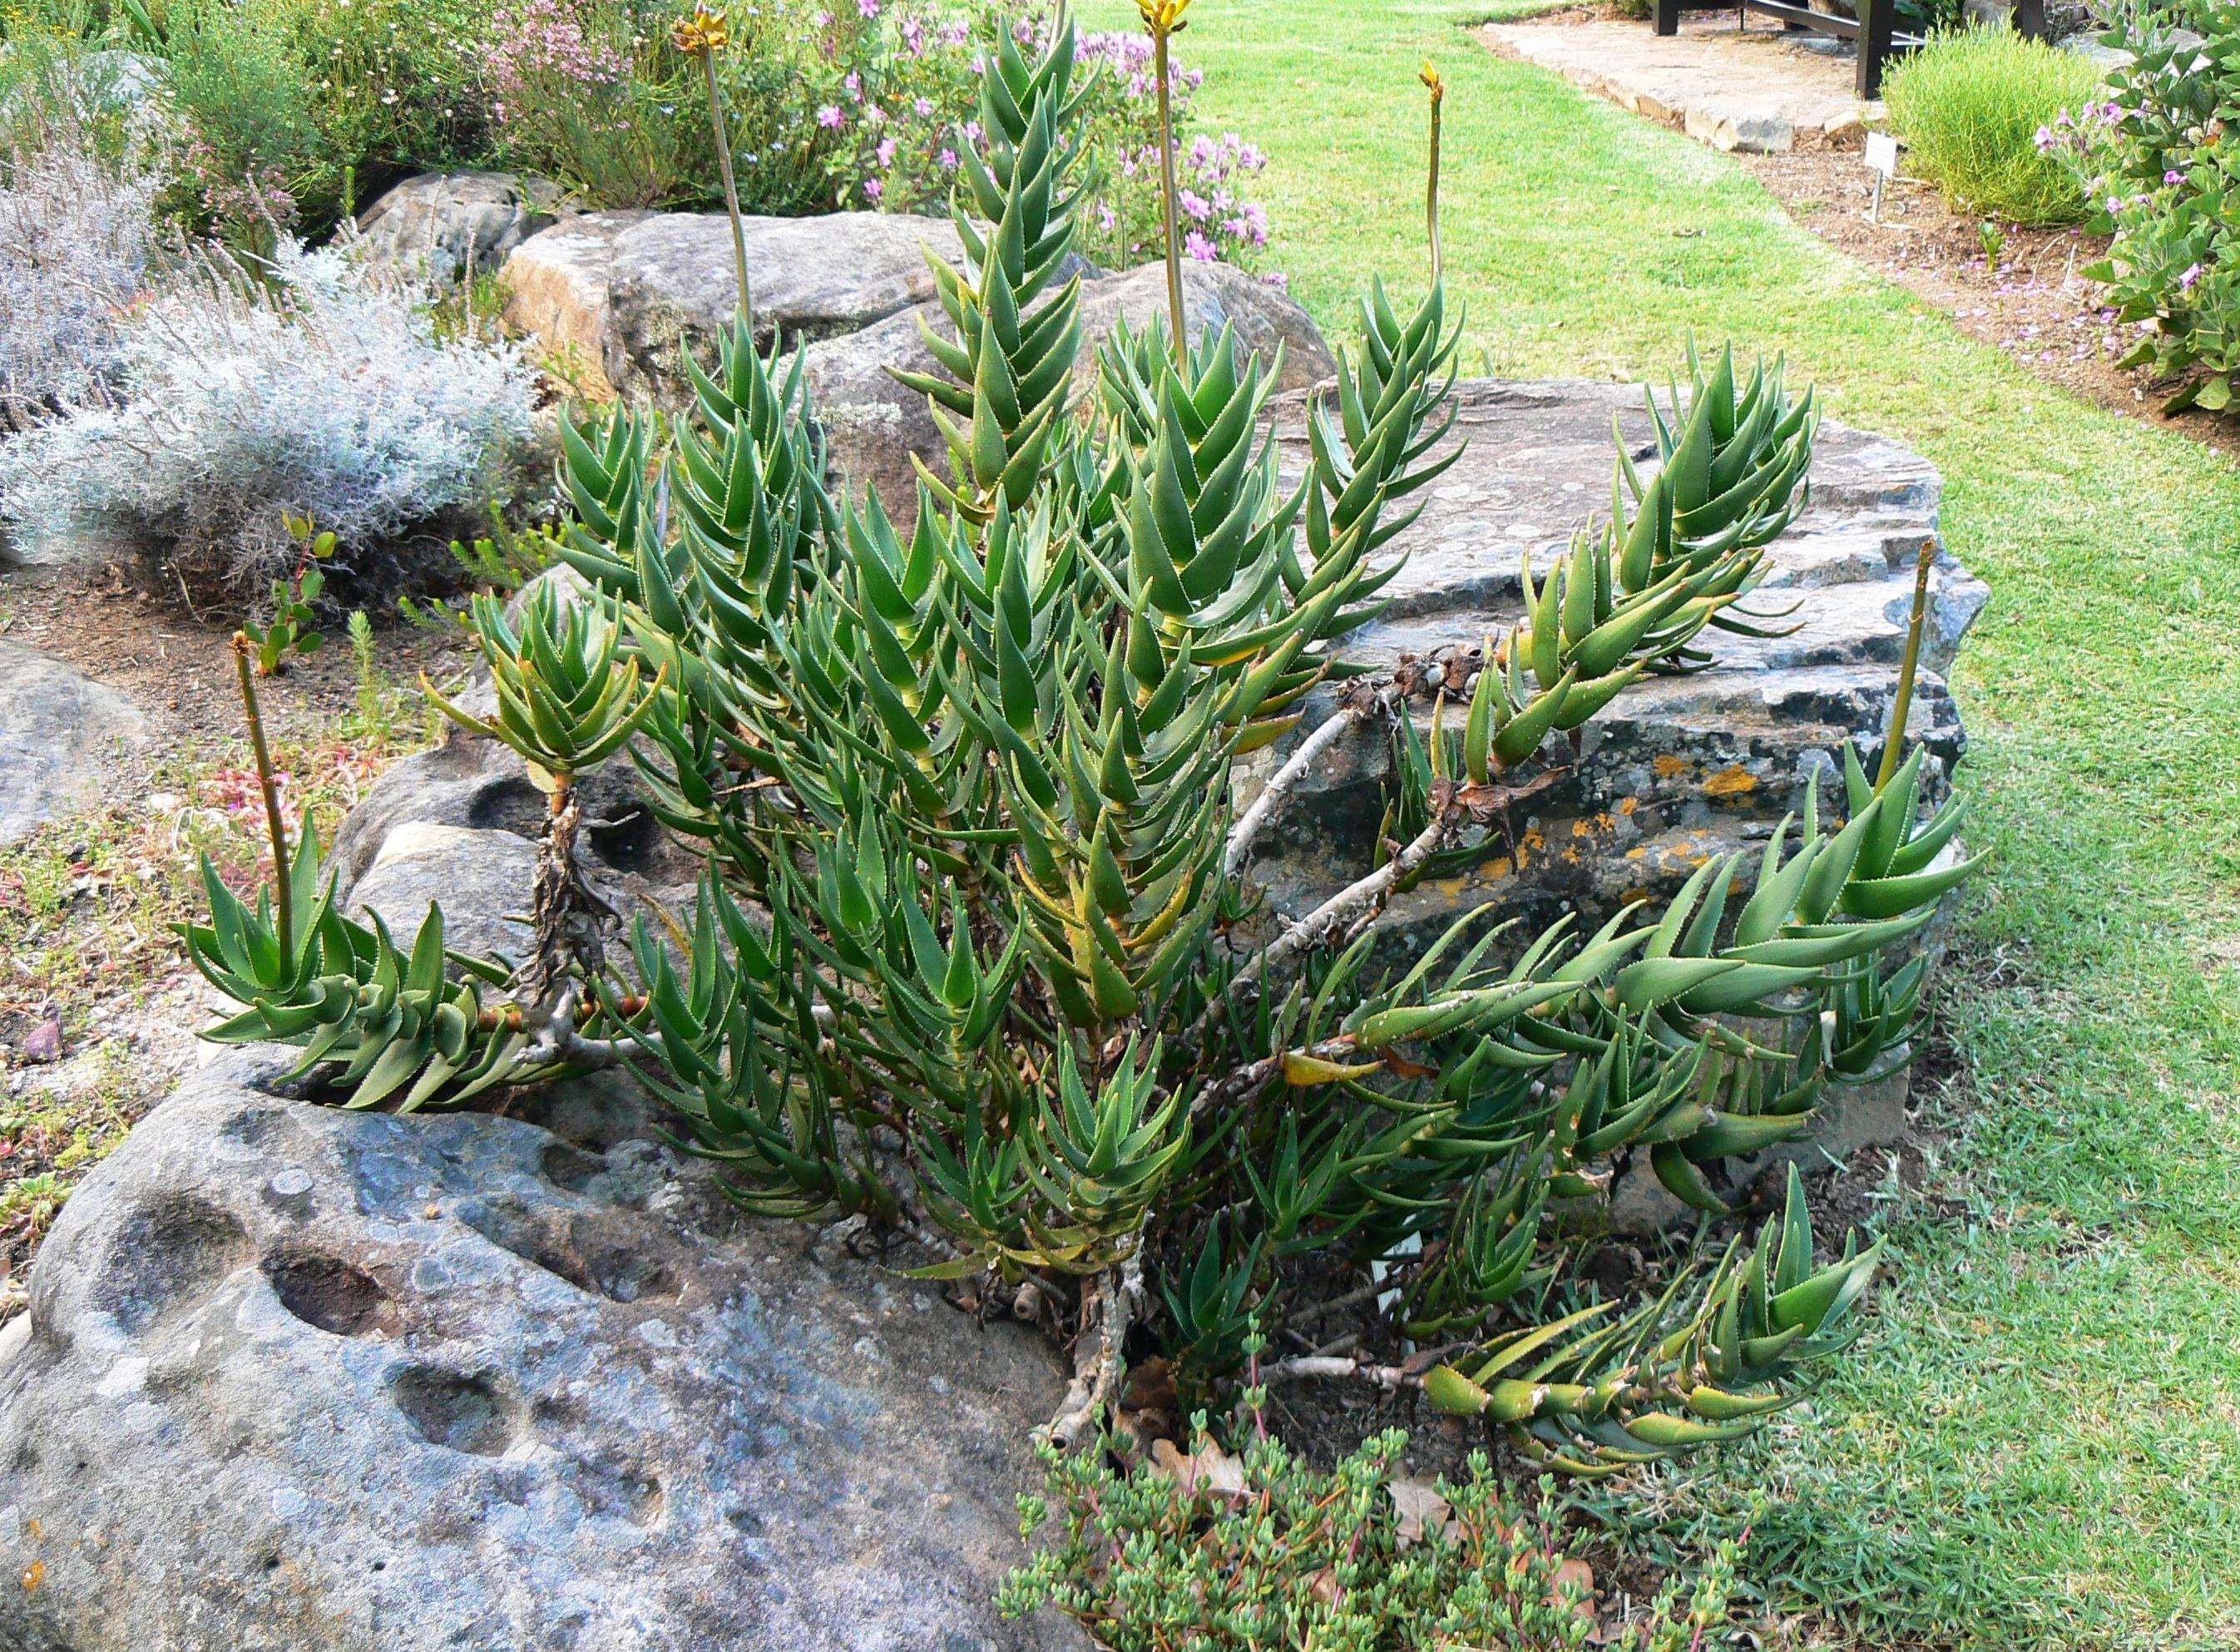 File:Aloe commixta.